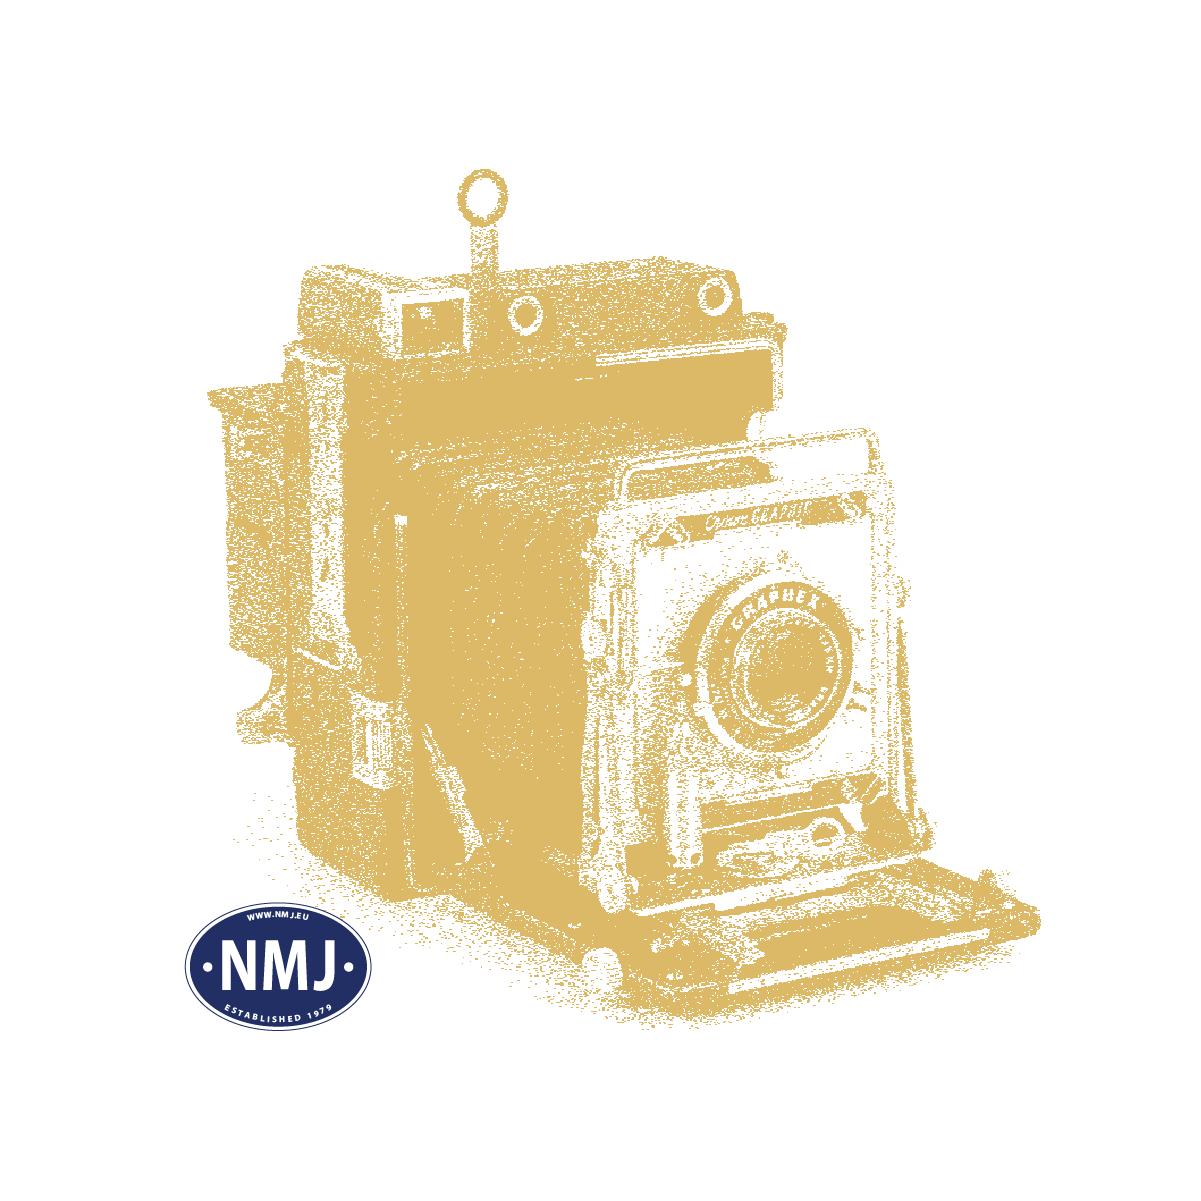 NMJST316494 - NMJ Superline NSB T3 16494 Stakevogn m/ Bremseplattform